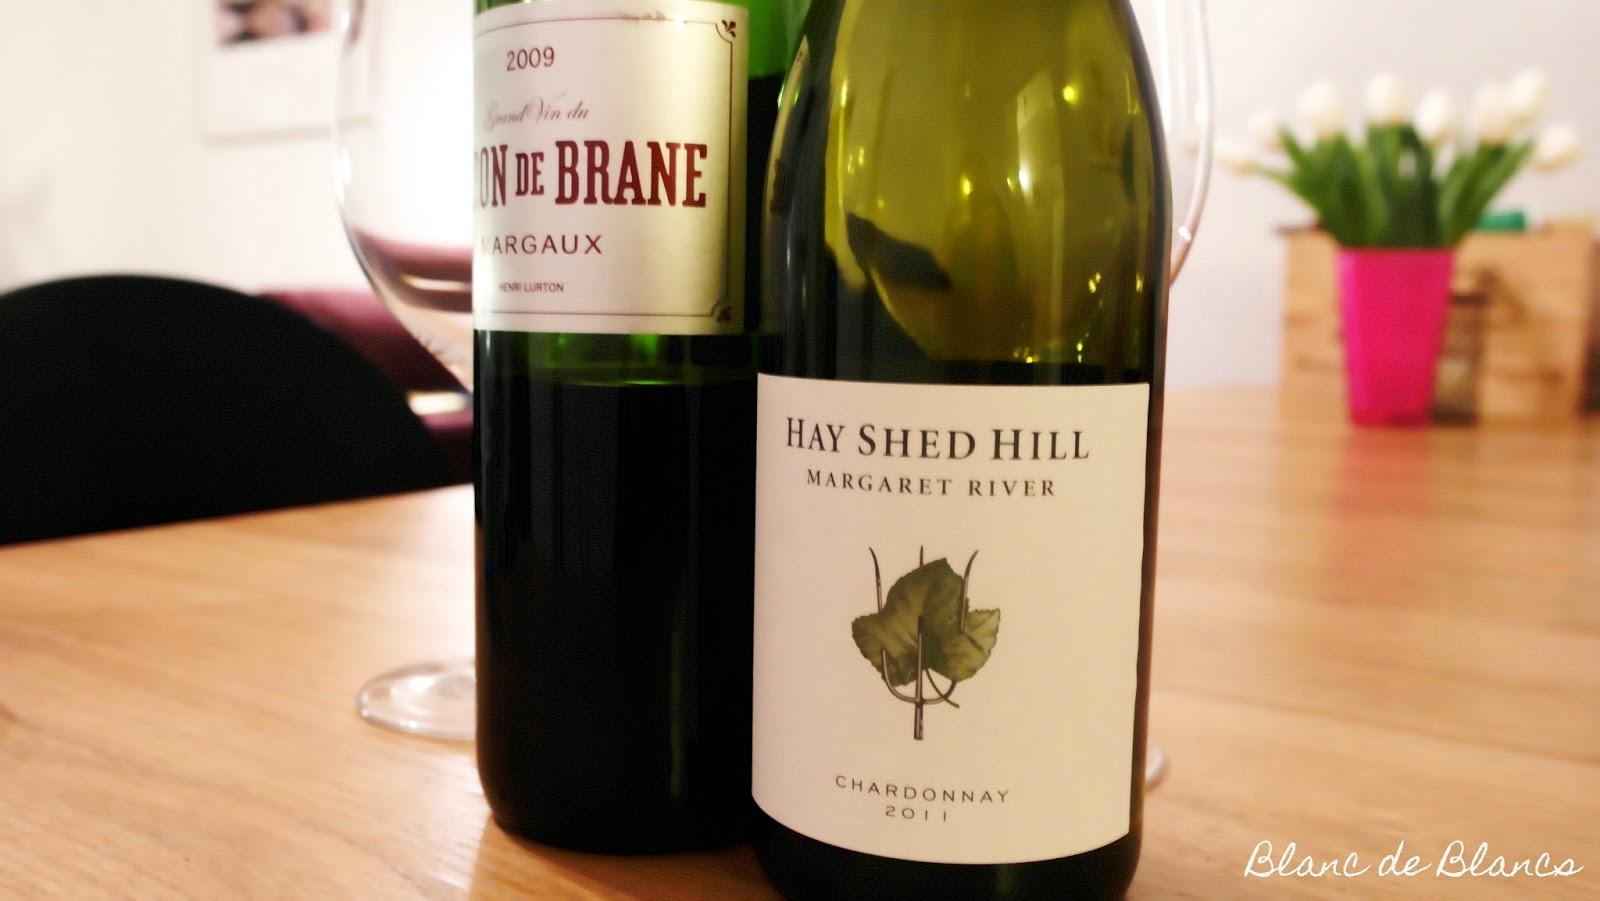 Le Baron de Brane 2009 ja Hay Shed Hill Chardonnay 2011 - www.blancdeblancs.fi